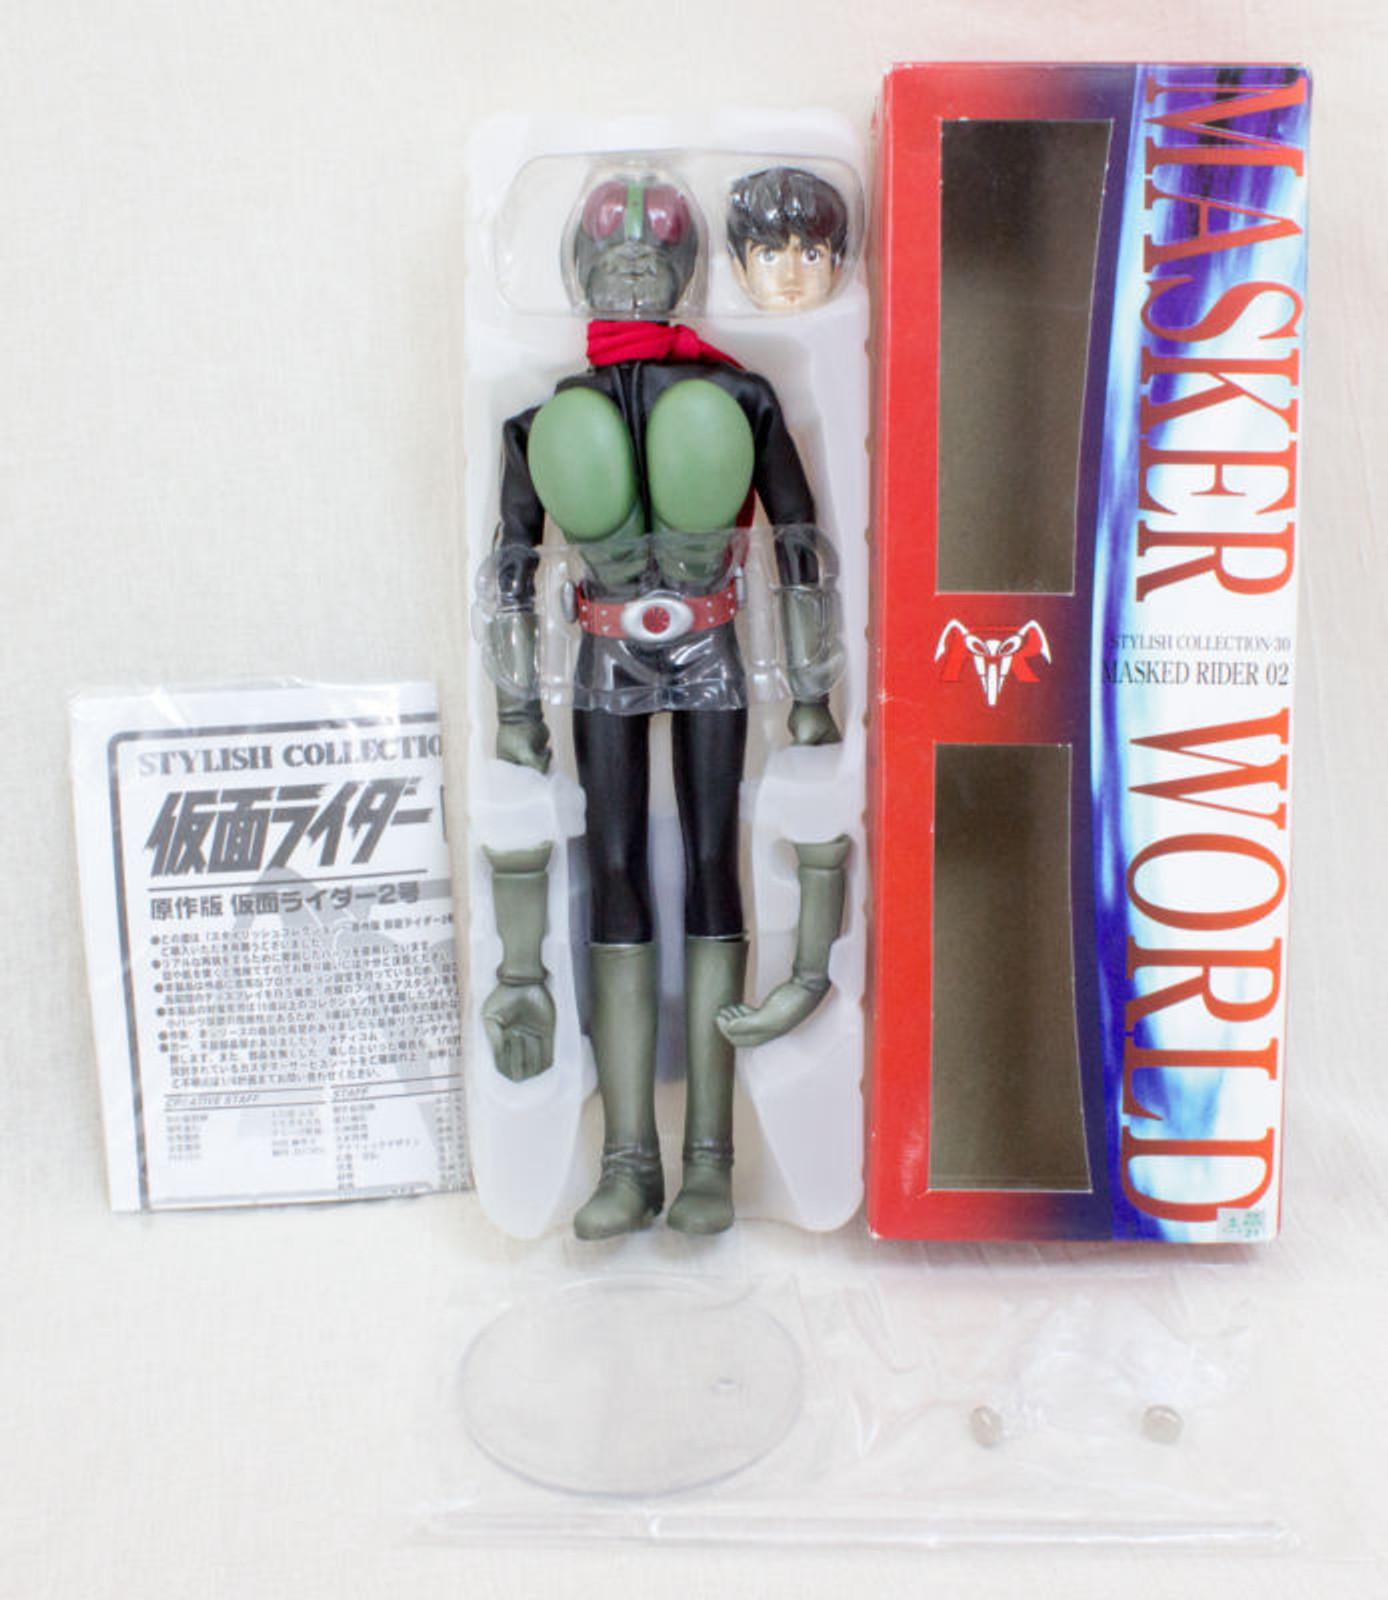 Kamen Rider 02 Stylish Collection Figure 30 Masker World Medicom Toy JAPAN